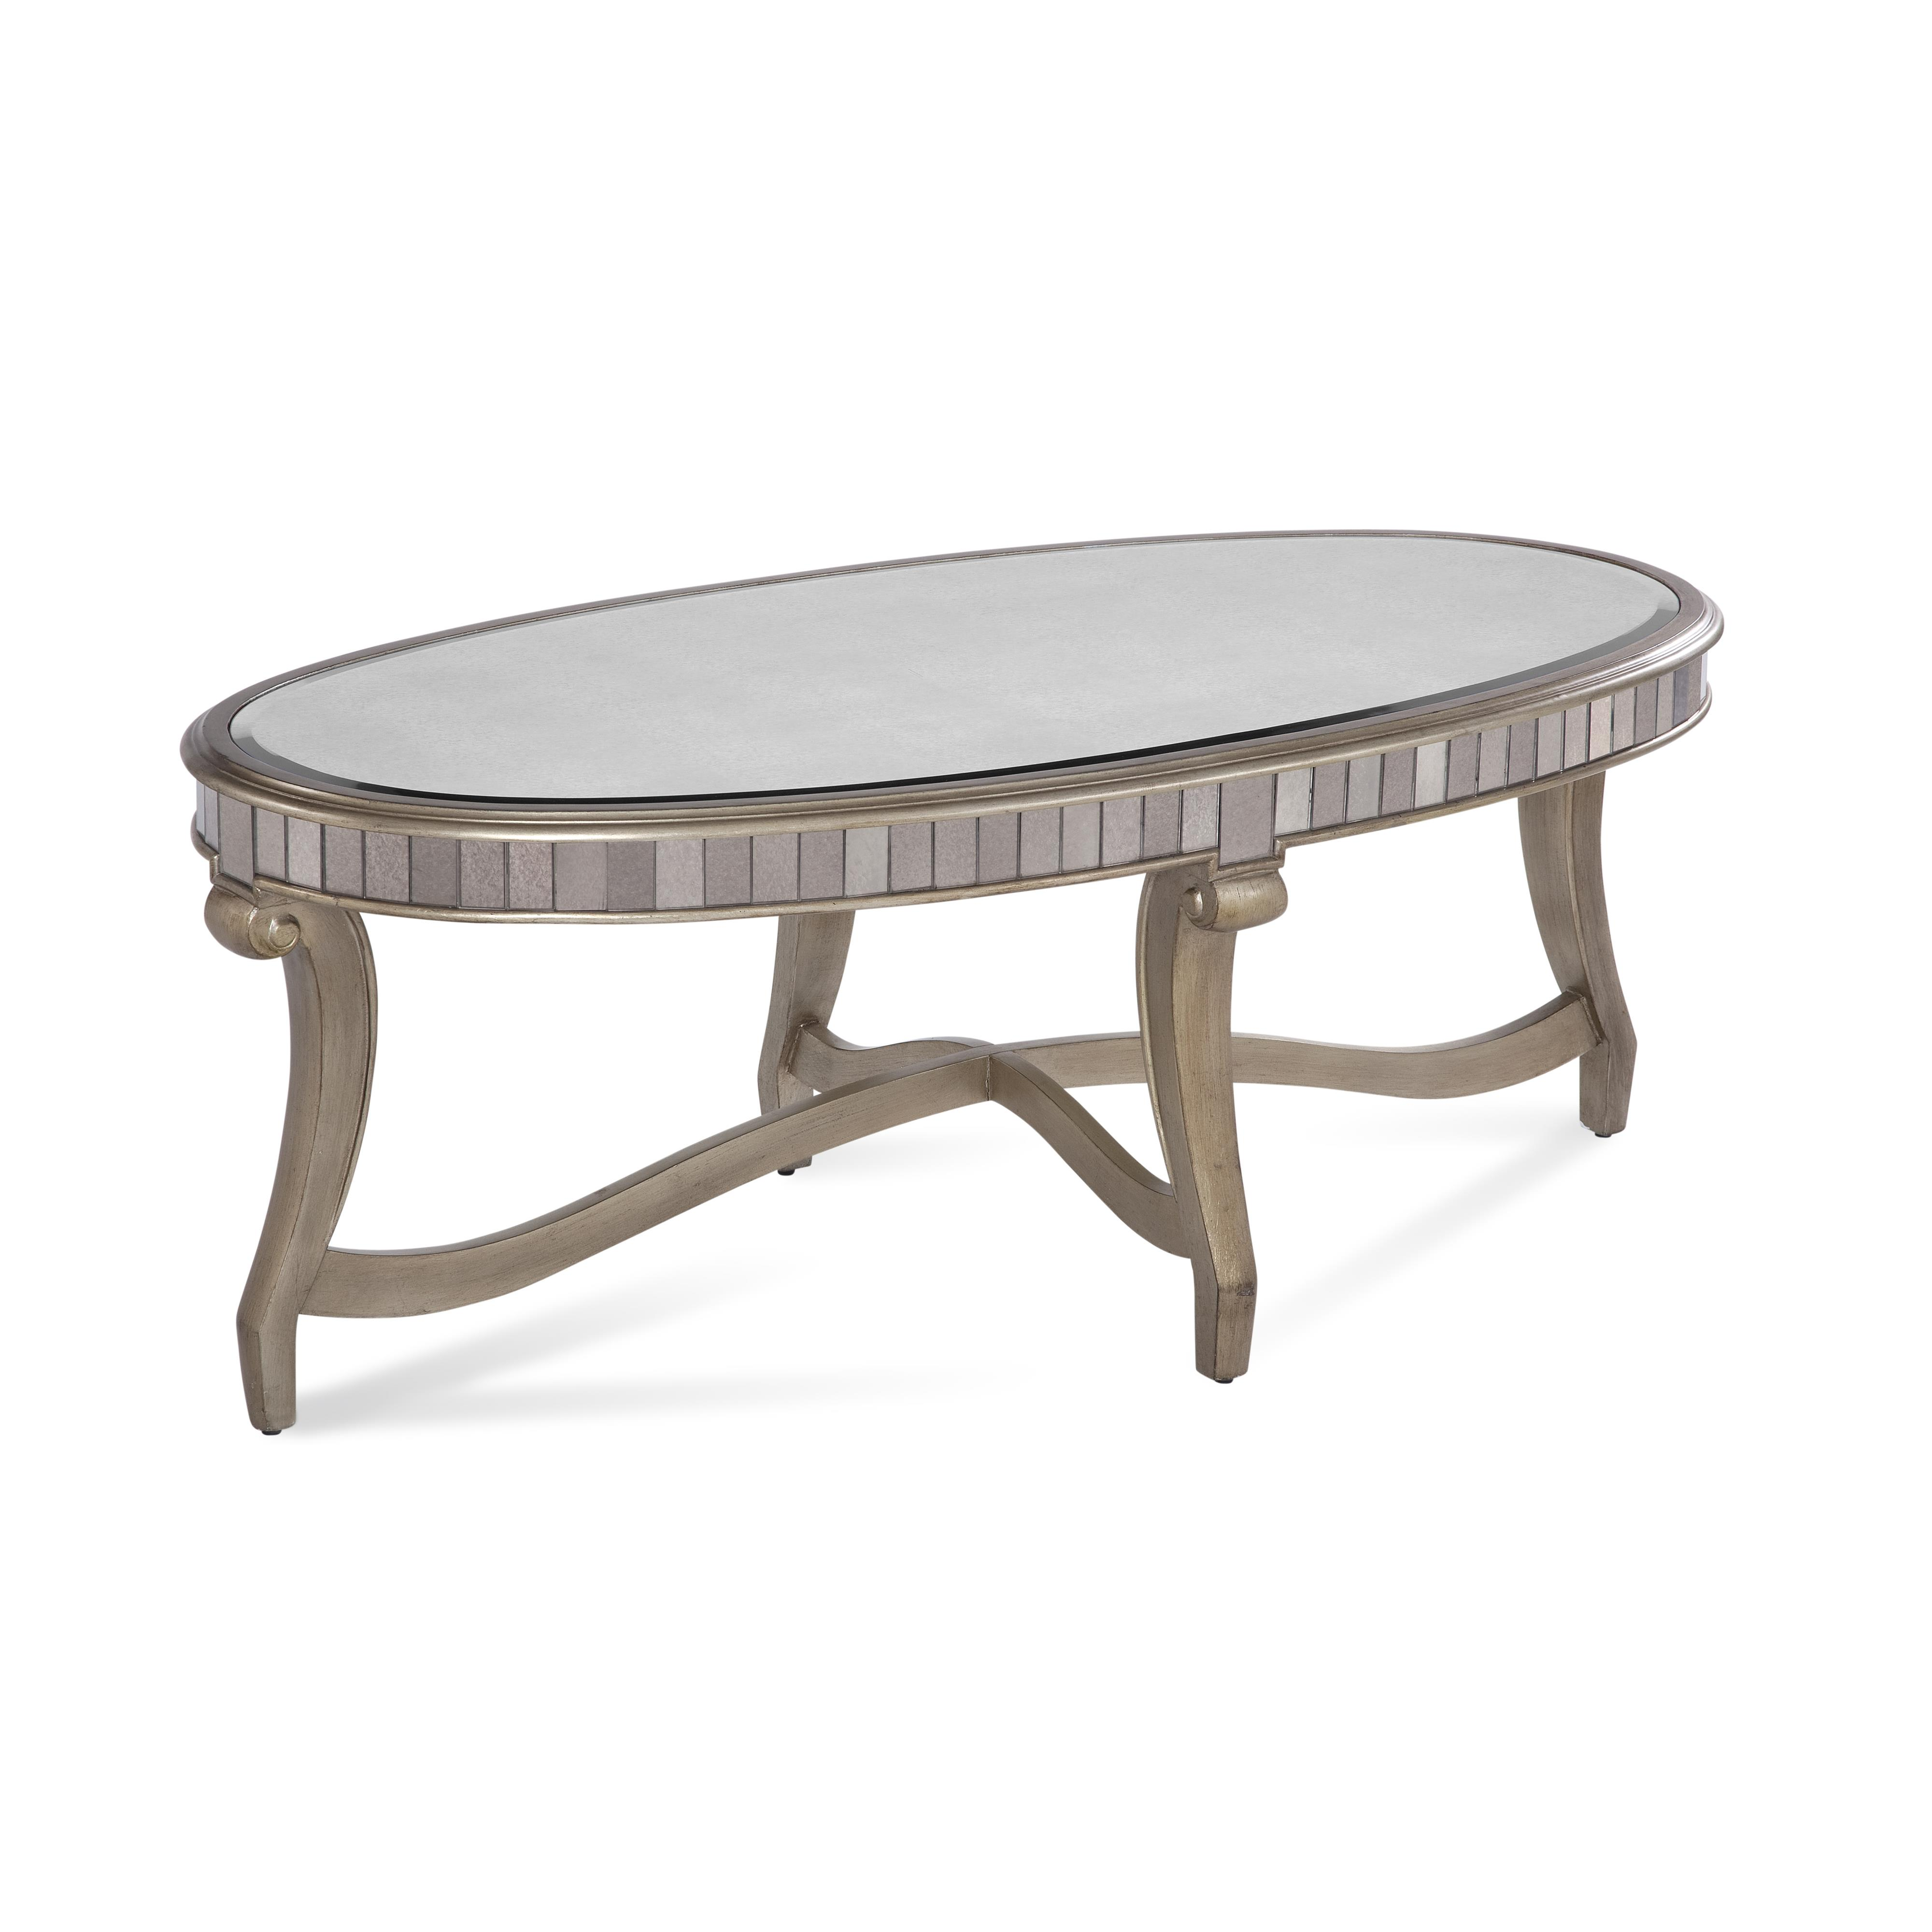 Celine Oval Cocktail Table